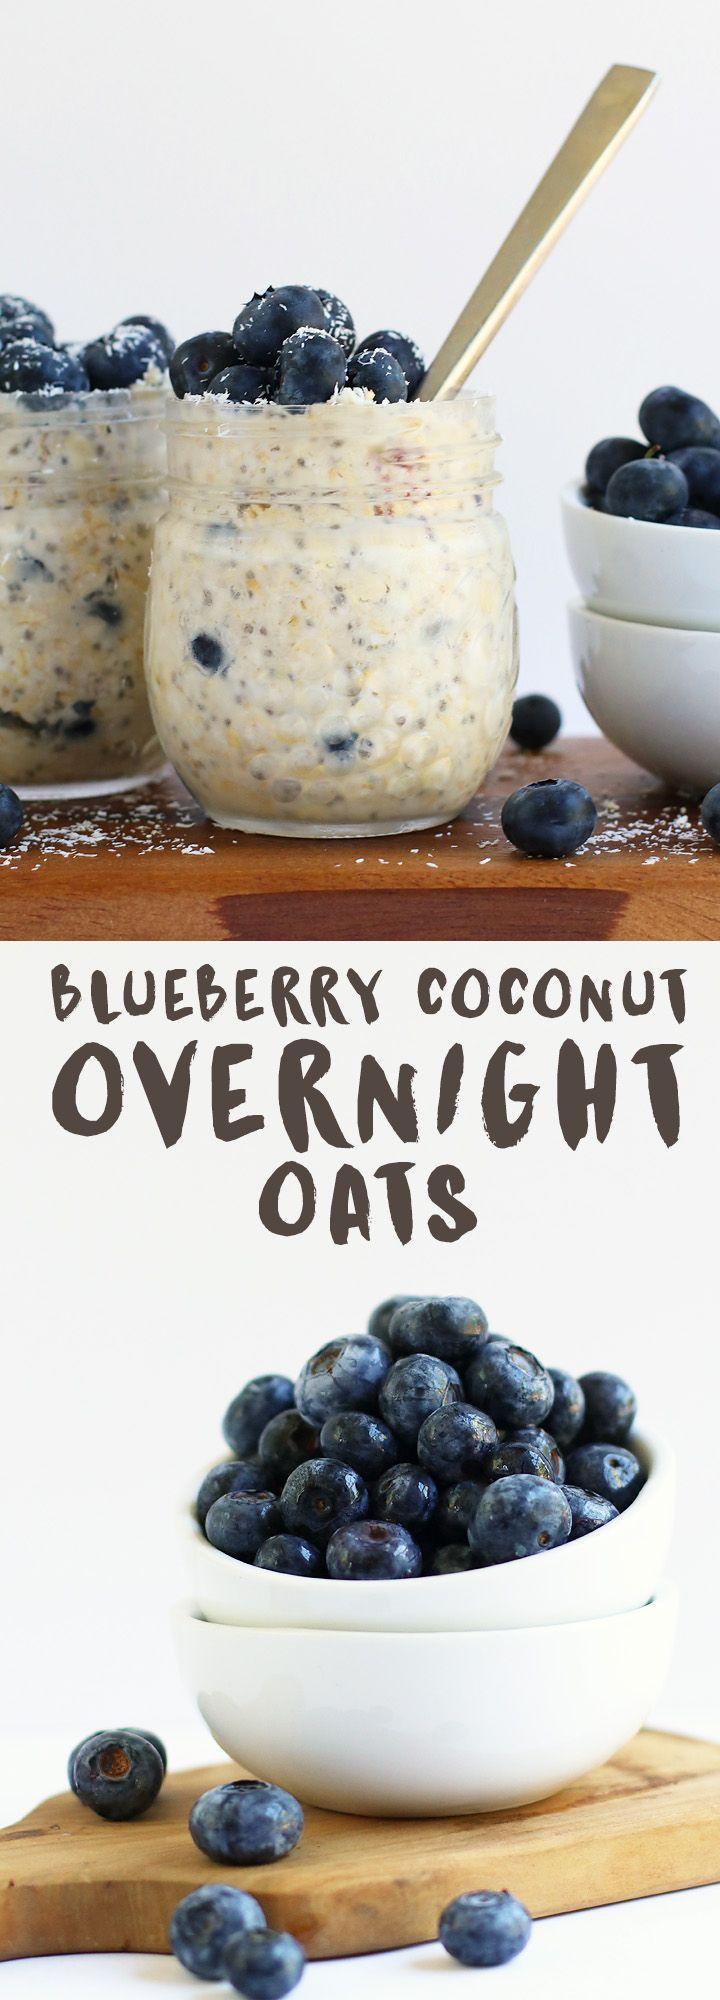 Blueberry Coconut Overnight Oats | My Darling Vegan